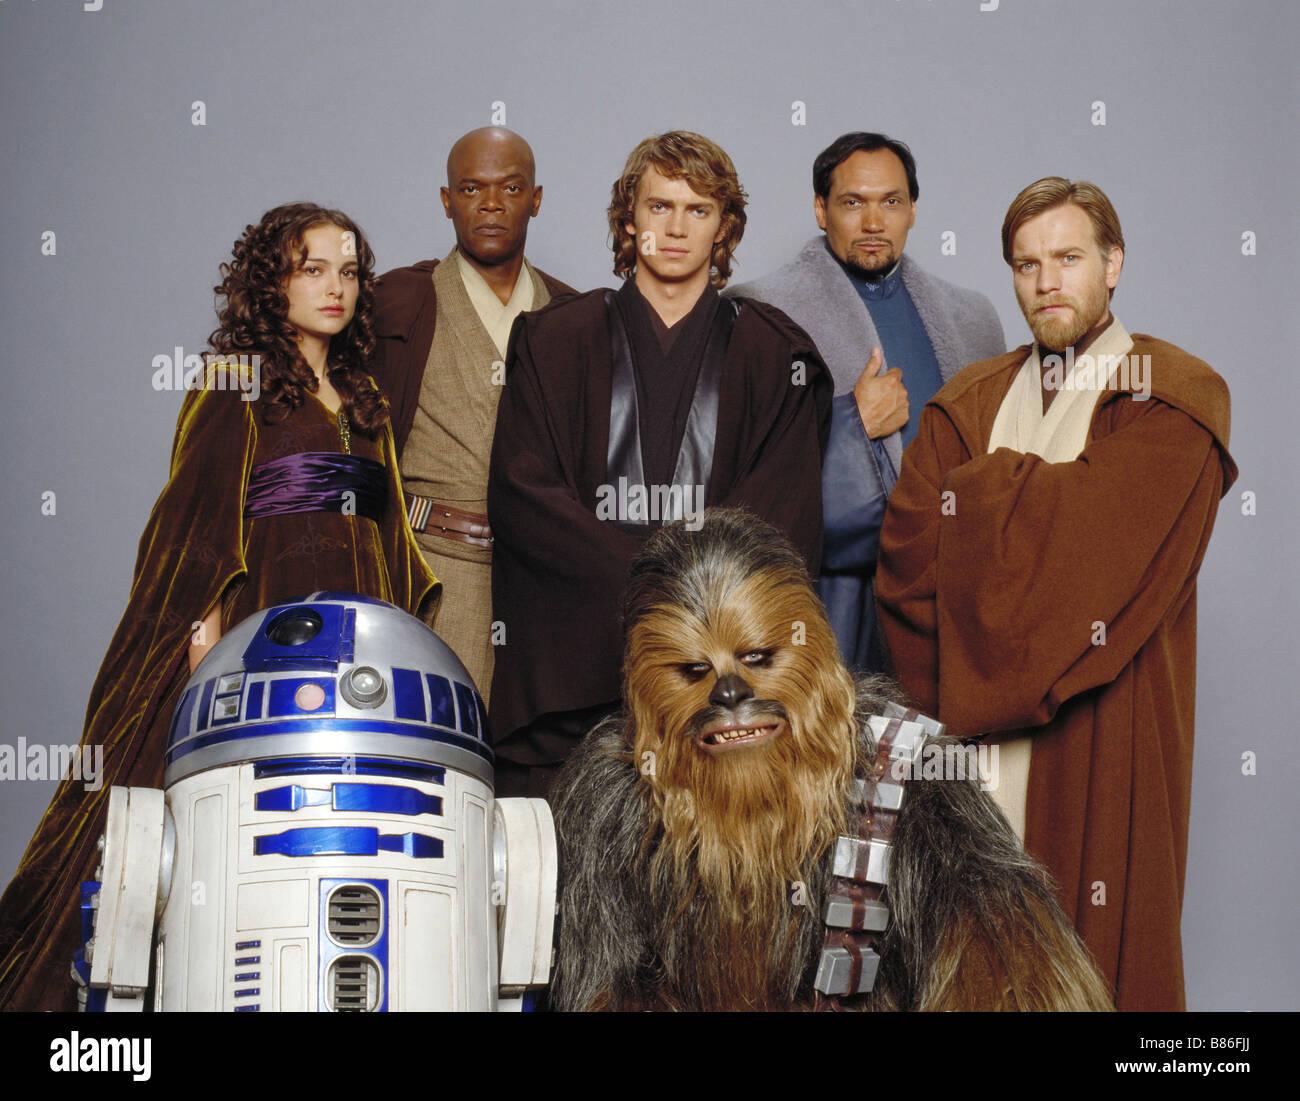 Star Wars : Episode III - Revenge of the Sith  Year : 2005 USA - USA Natalie Portman, Samuel L. Jackson, Hayden - Stock Image